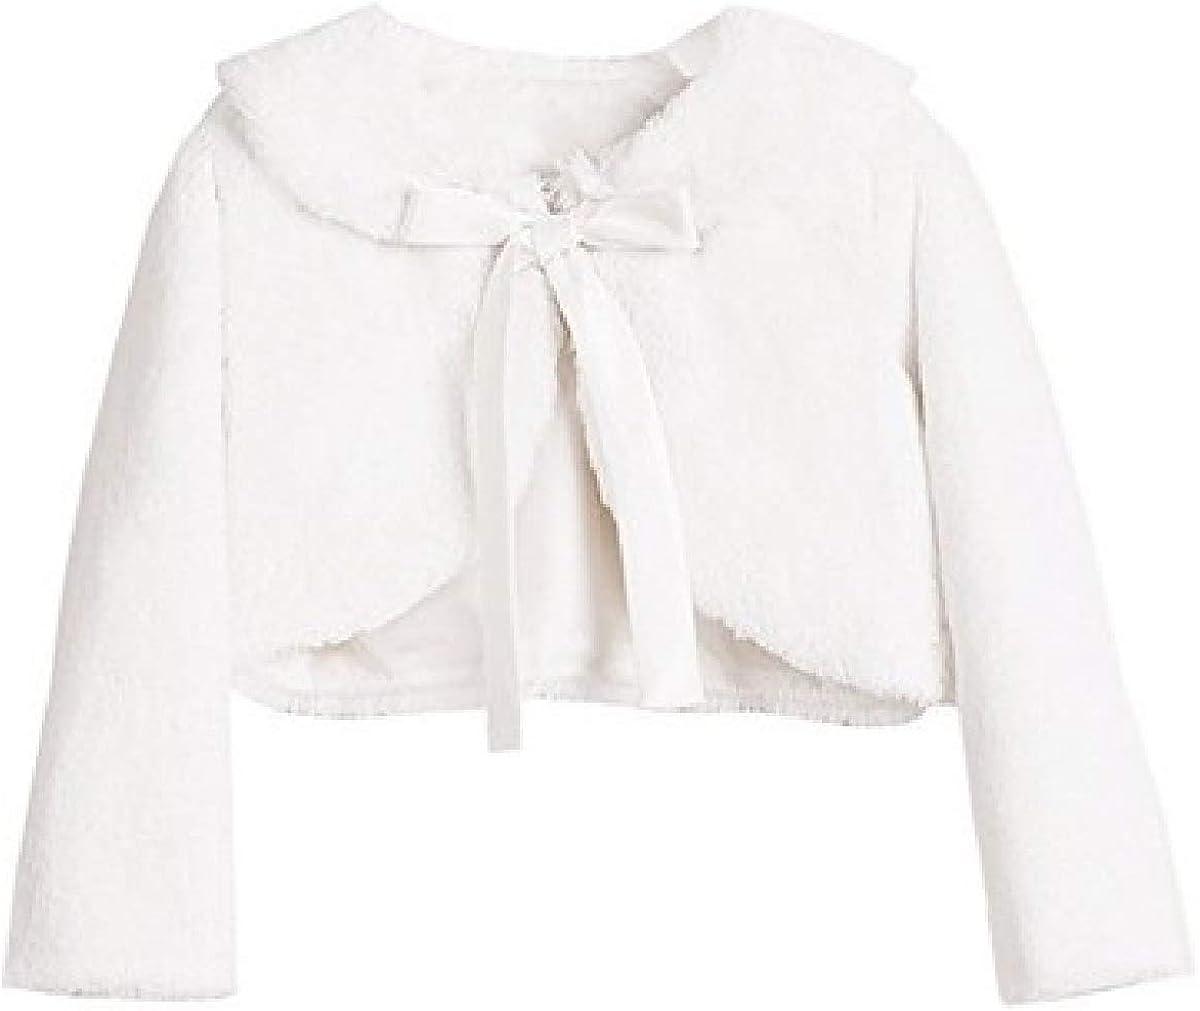 Aki_Dress Ribbon Faux Fur Jacket Satin Ribbon Collar Jacket Sweater Bolero